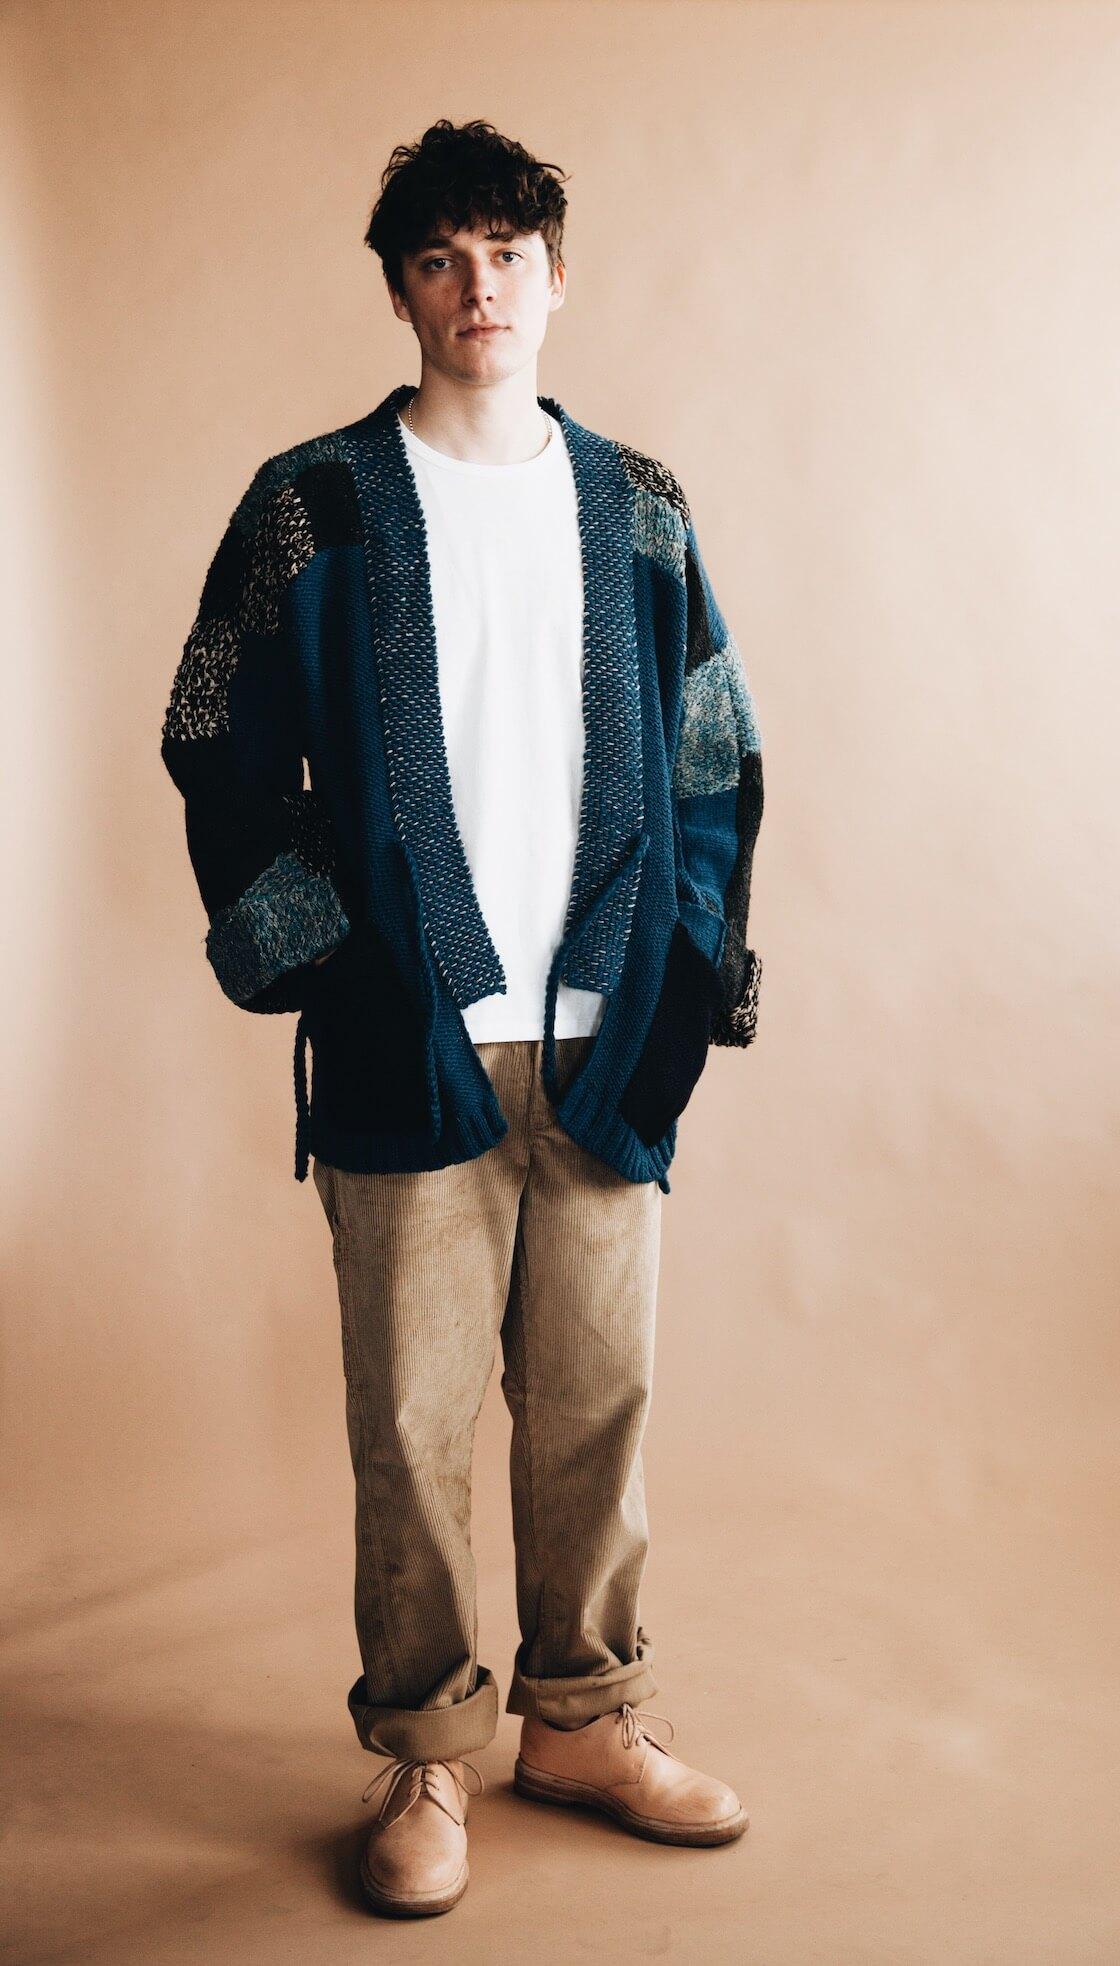 kapital hand knit tugihagi kakashi cardigan and hender scheme mip 21 shoes on body